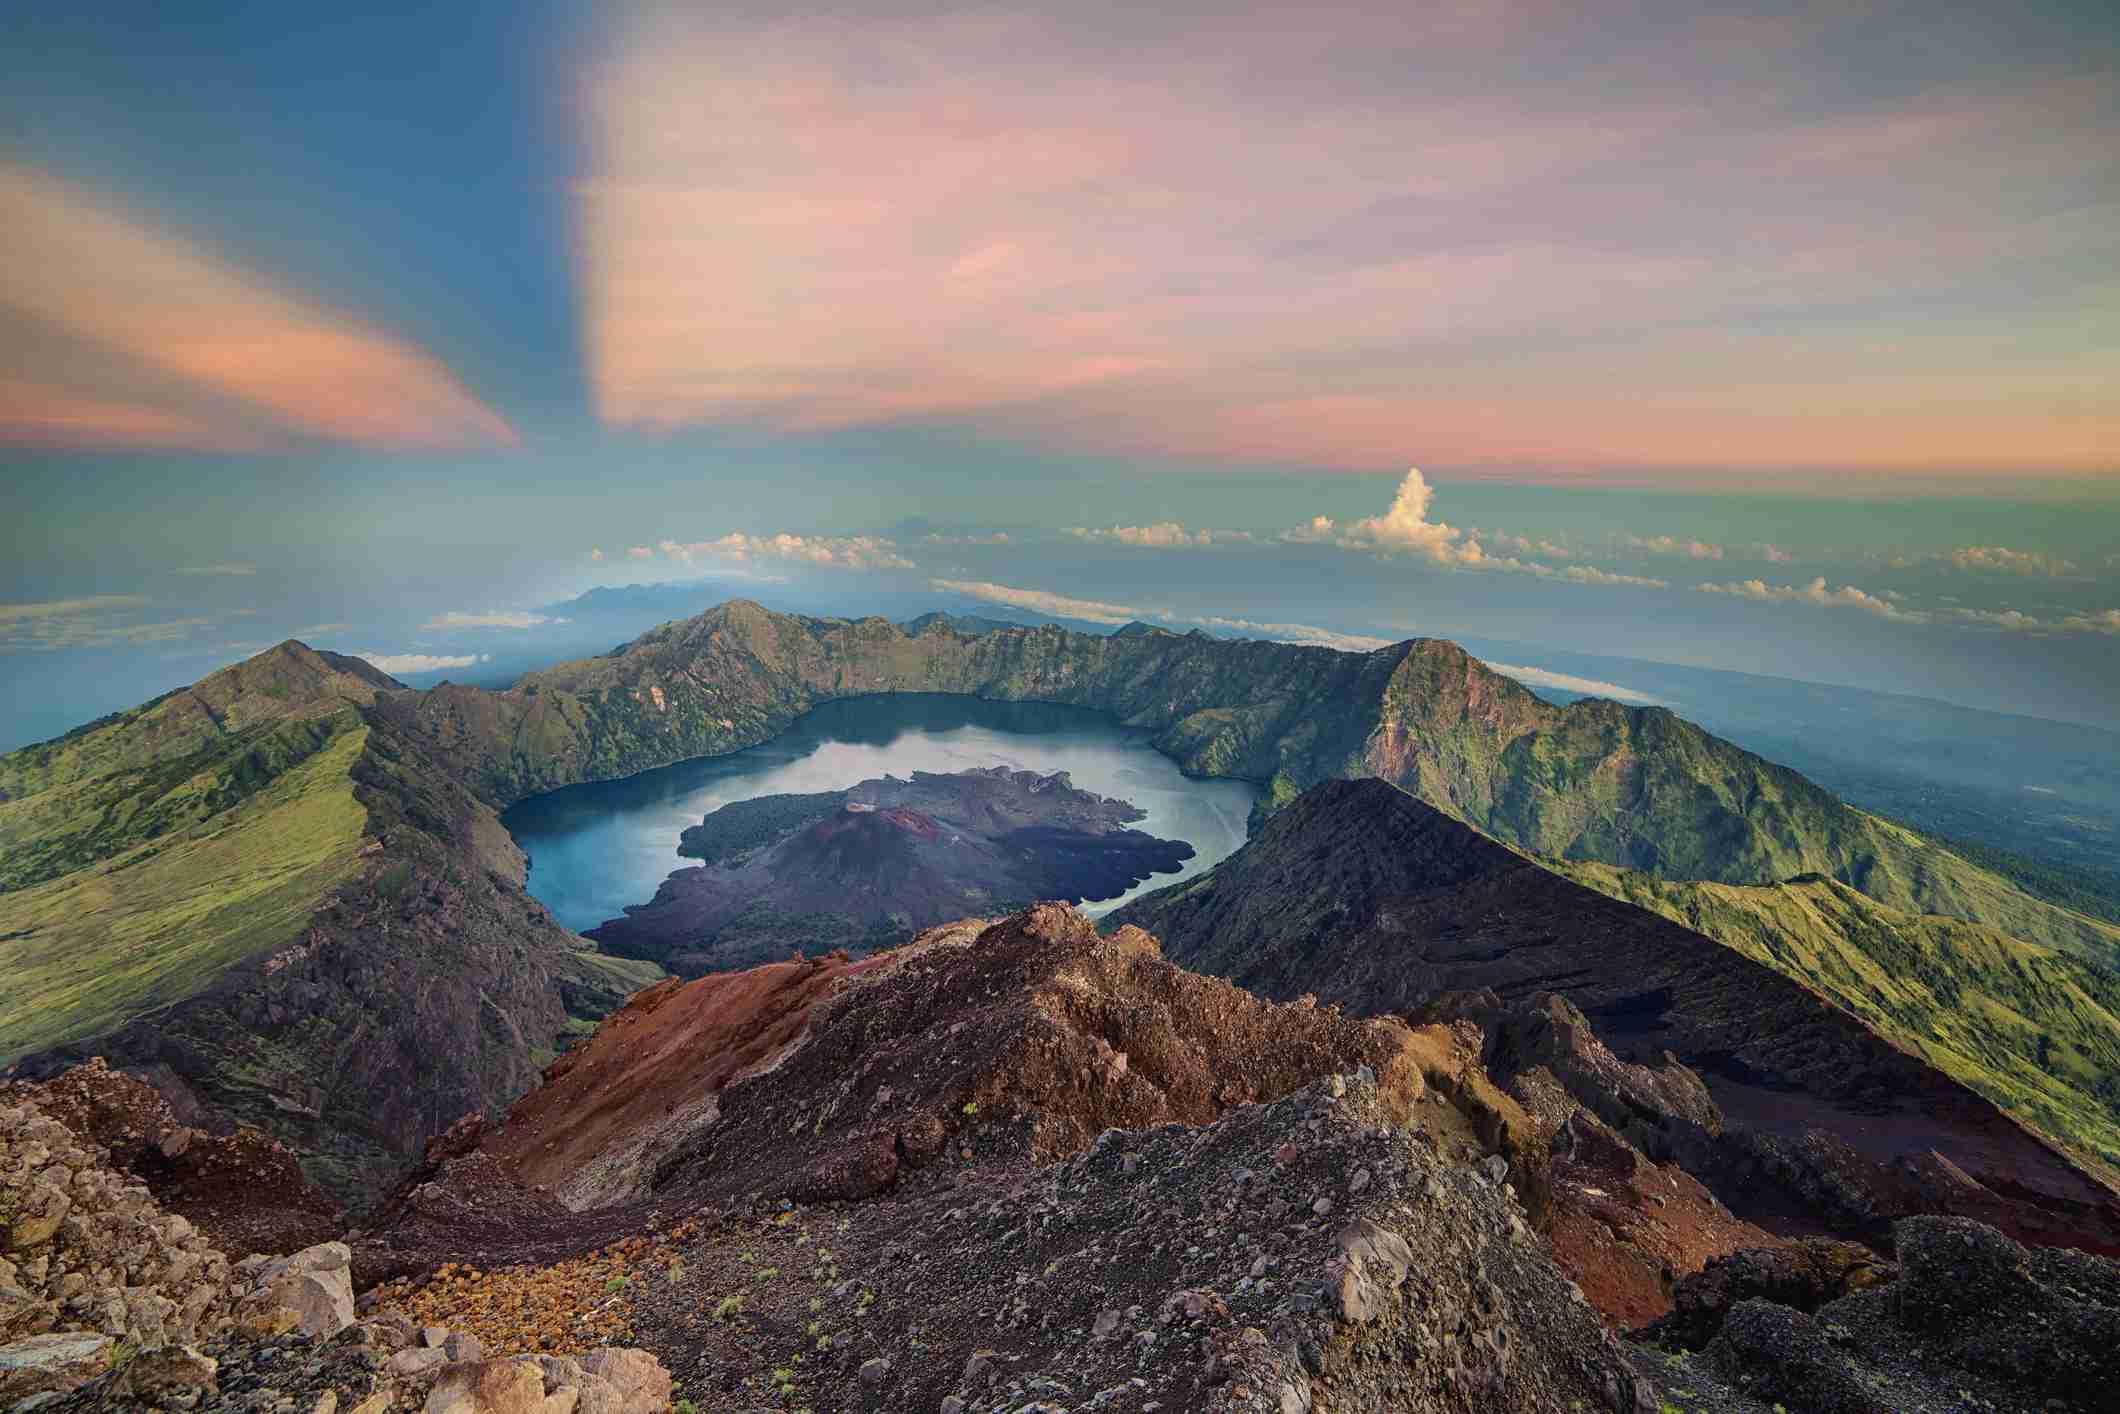 The volcanic crater of Gunung Rinjani during sunrise